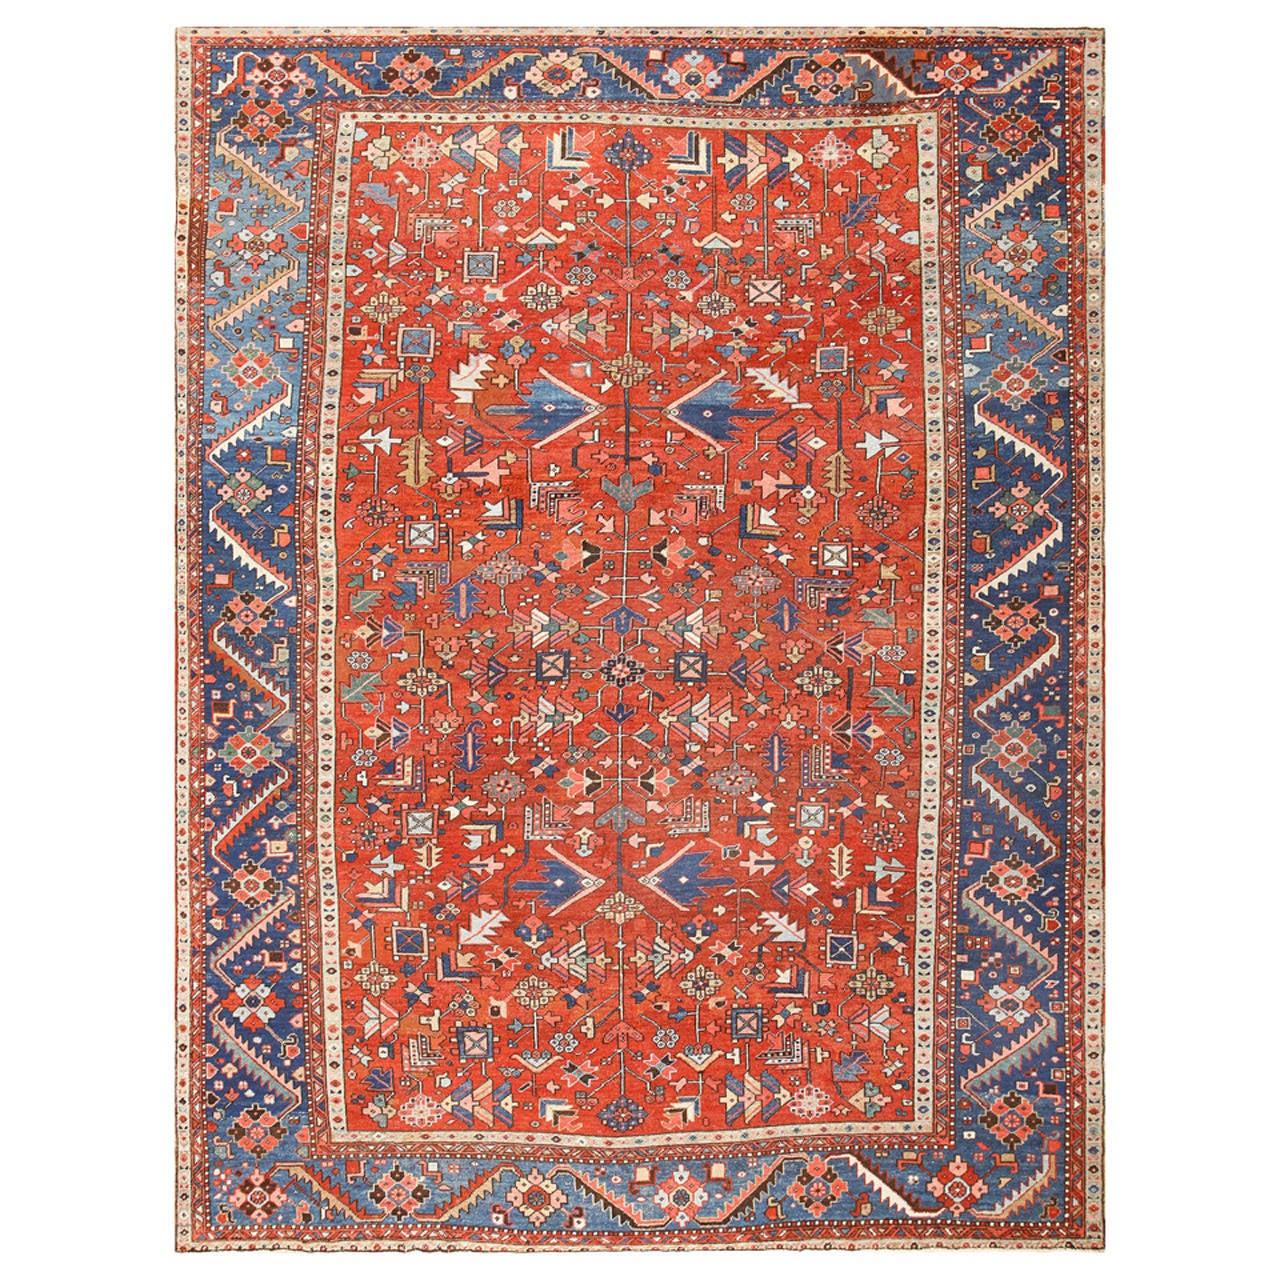 Antique Persian Heriz Rug Bb2402: Antique Persian Heriz Serapi Rug At 1stdibs